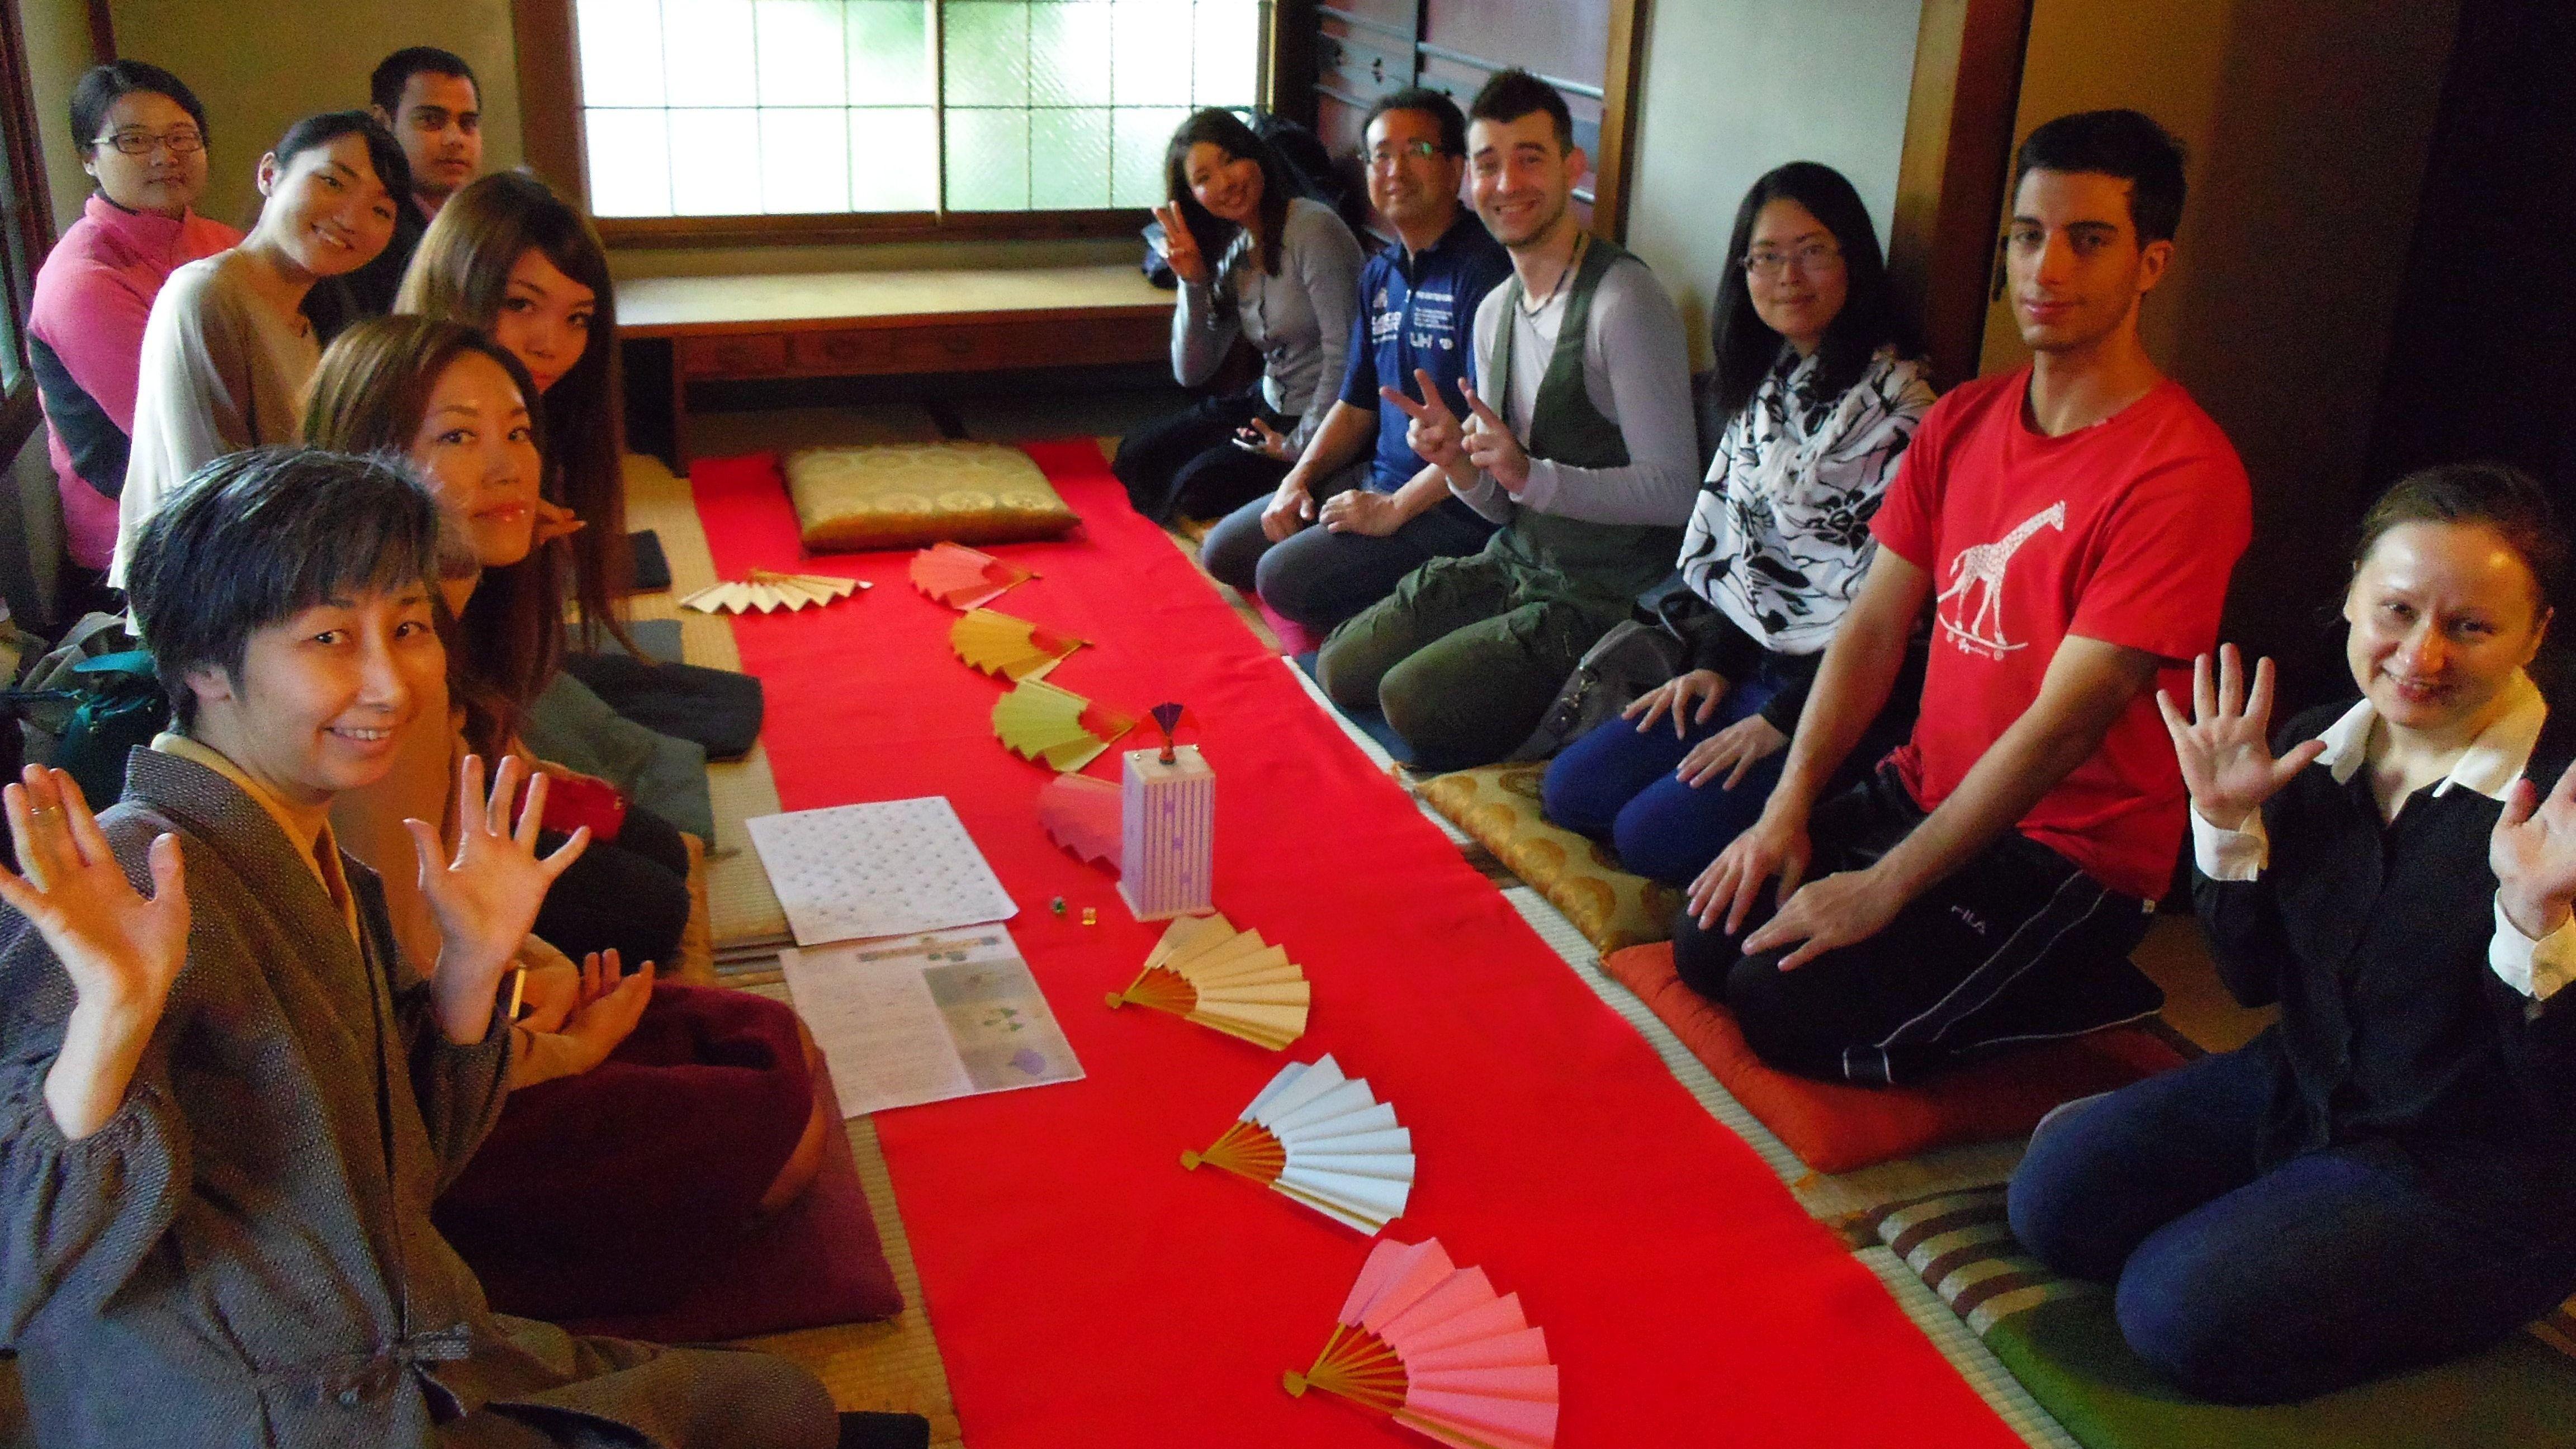 Japanize (Japanese Culture Experience)